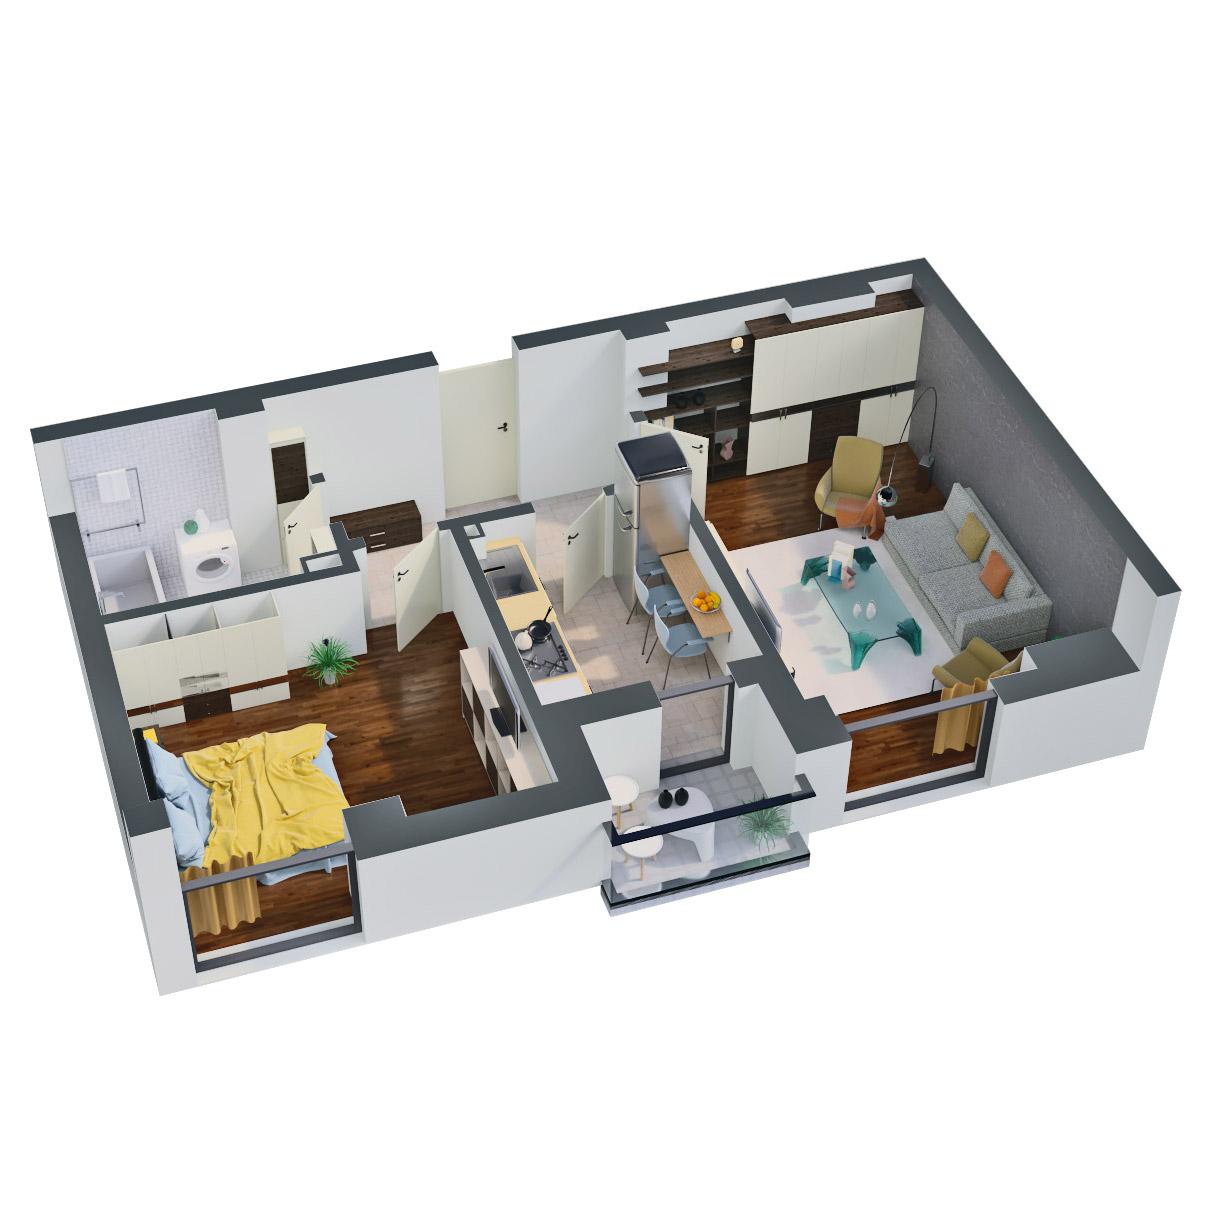 Apartament 2 camere de vanzare Bucuresti - Catedral Residence - Marriott, Piata Unirii, 13 Septembrie, Izvor - Tip 1 - T2 - C